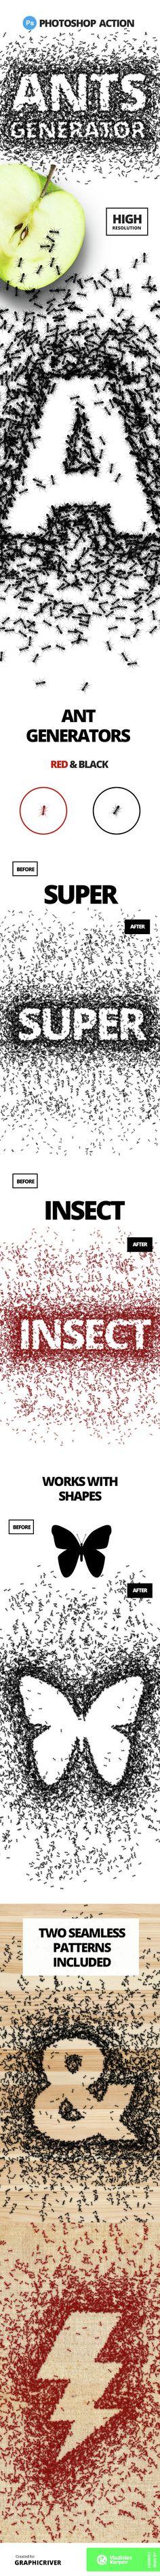 Ants Generator - Photoshop action. Creative & Unique